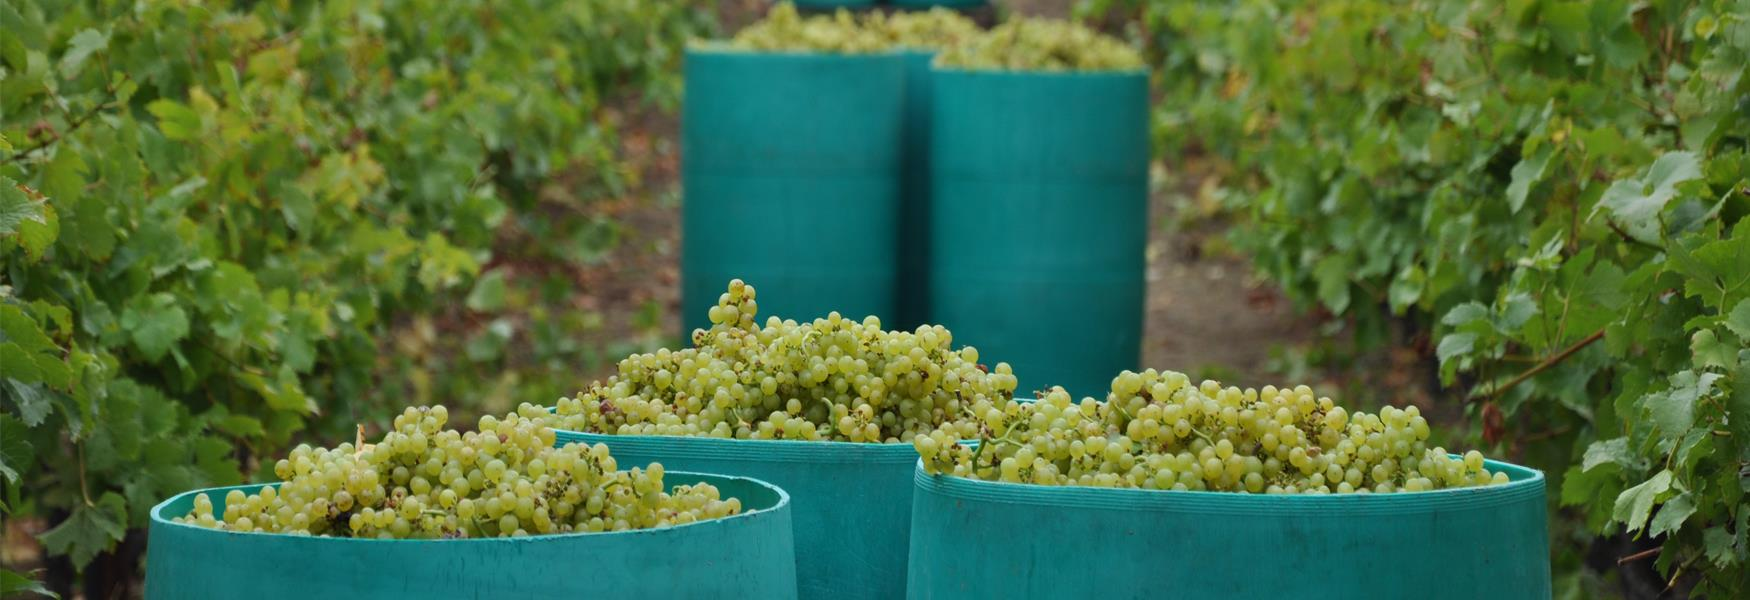 Grape Harvest at Biddenden Vineyard